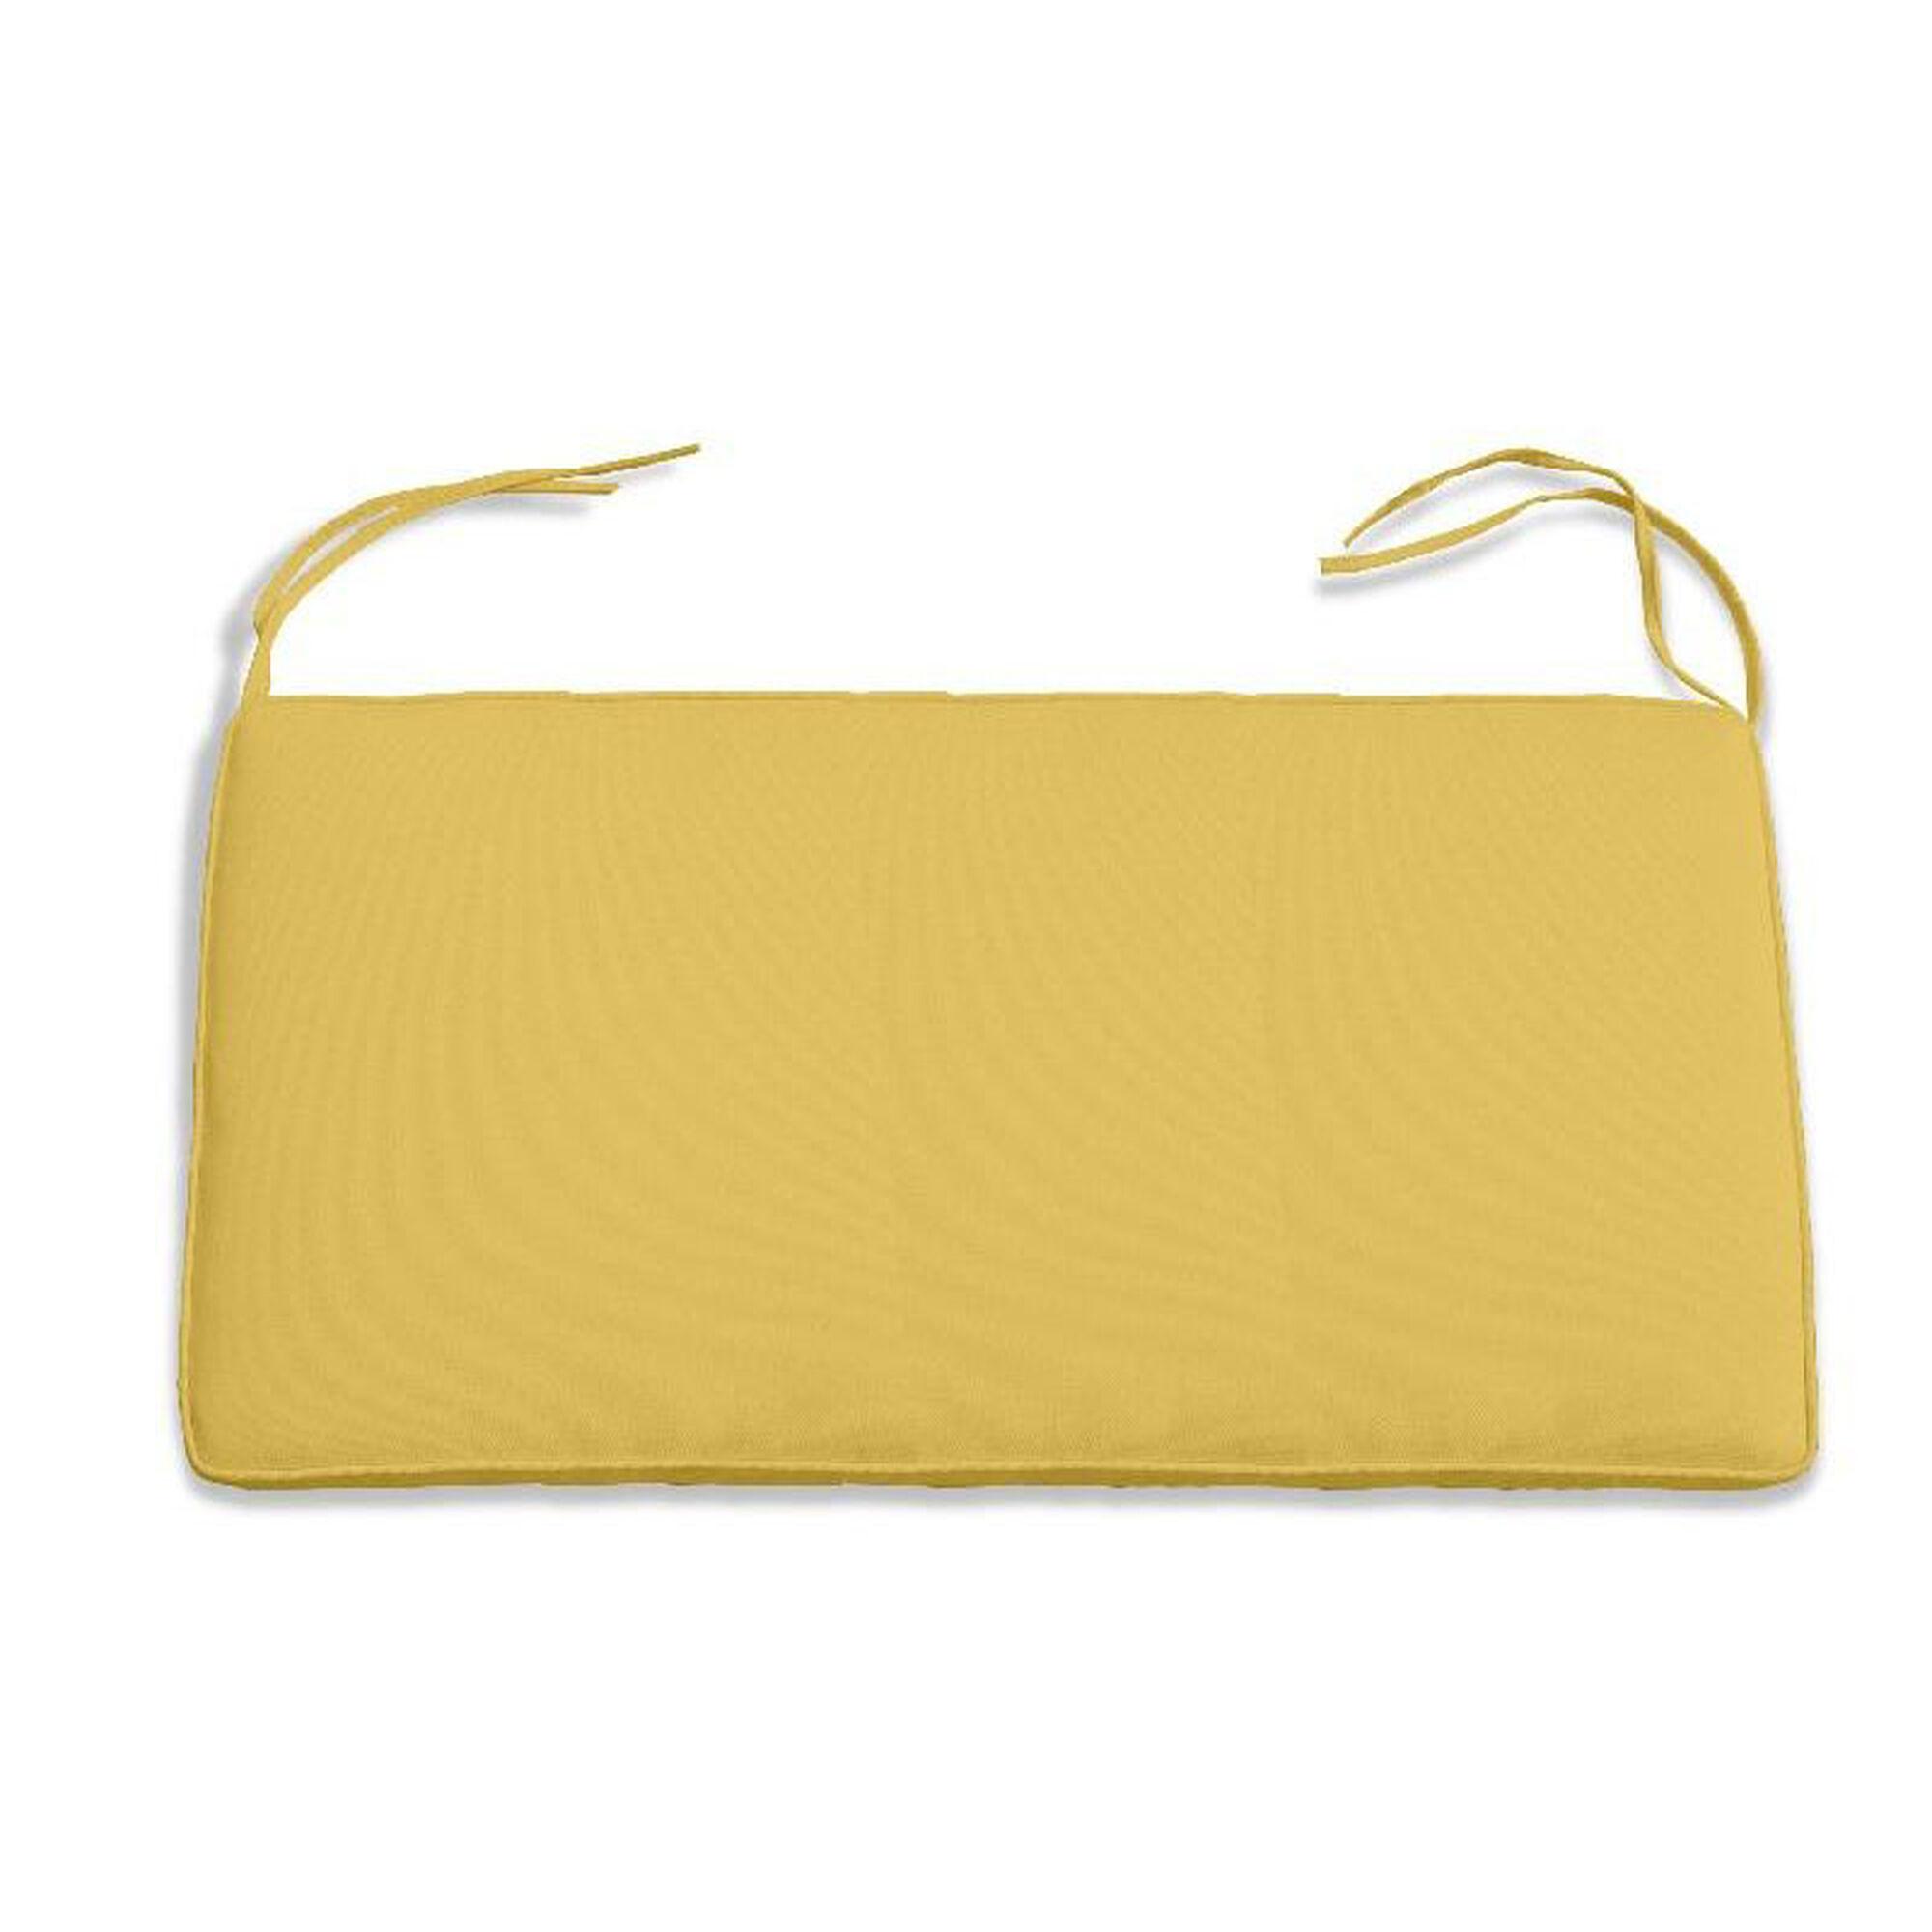 Compamia Miami Loveseat Cushion Buttercup Isp845 C 5438